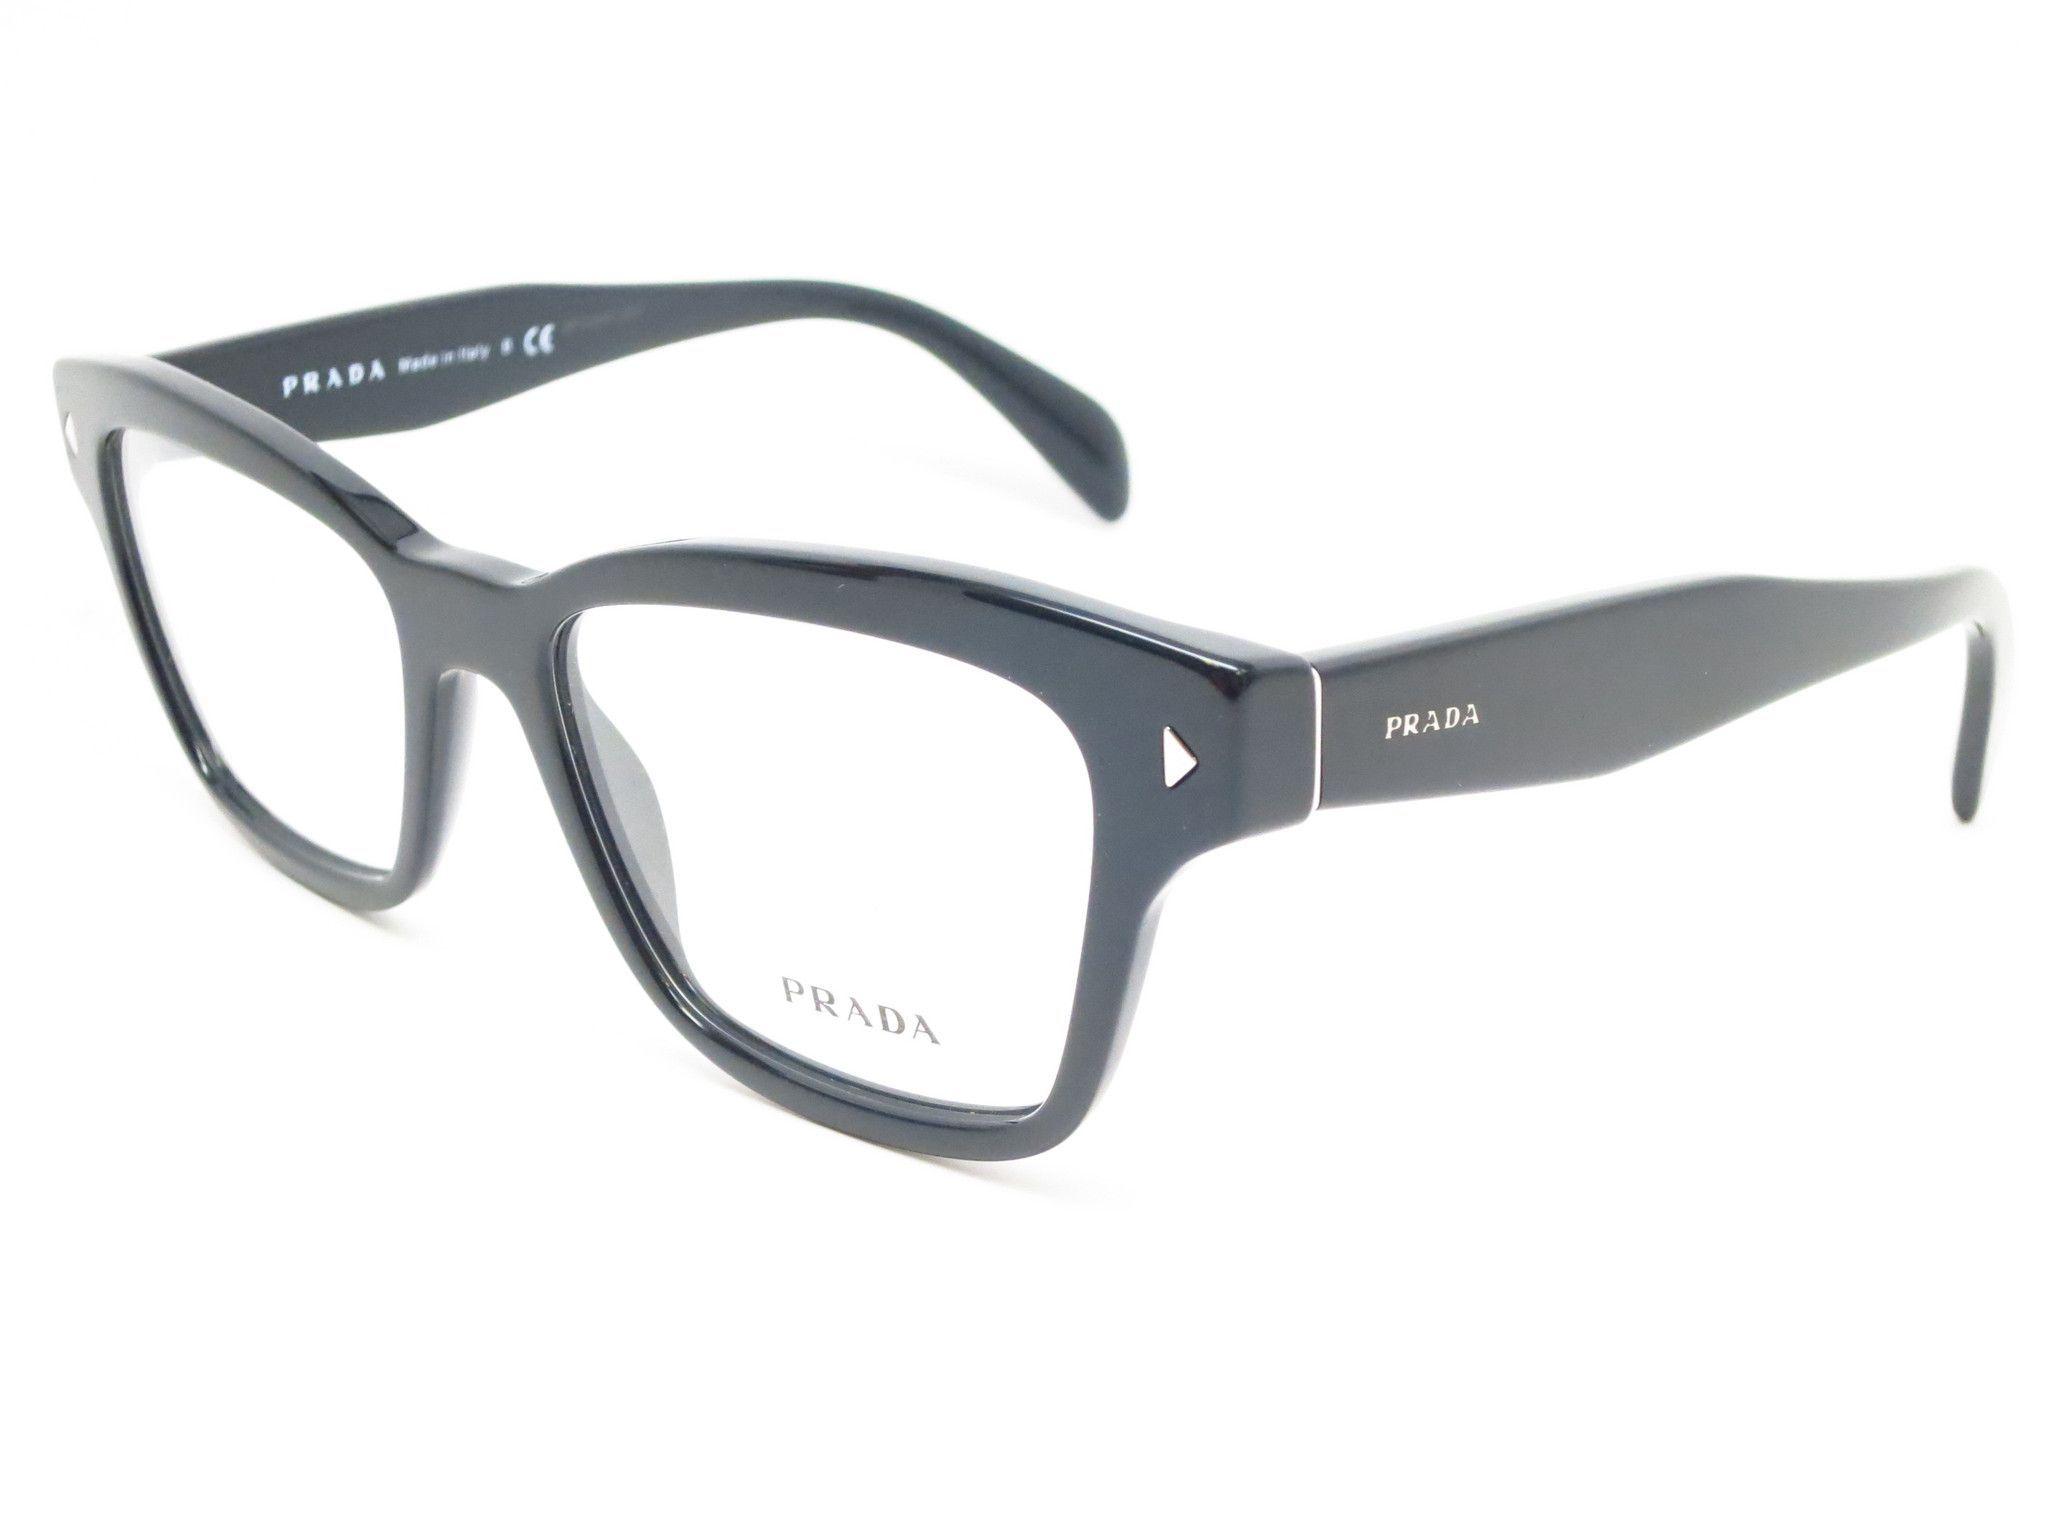 74a9828daded Prada VPR 10S 1AB-1O1 Black Eyeglasses